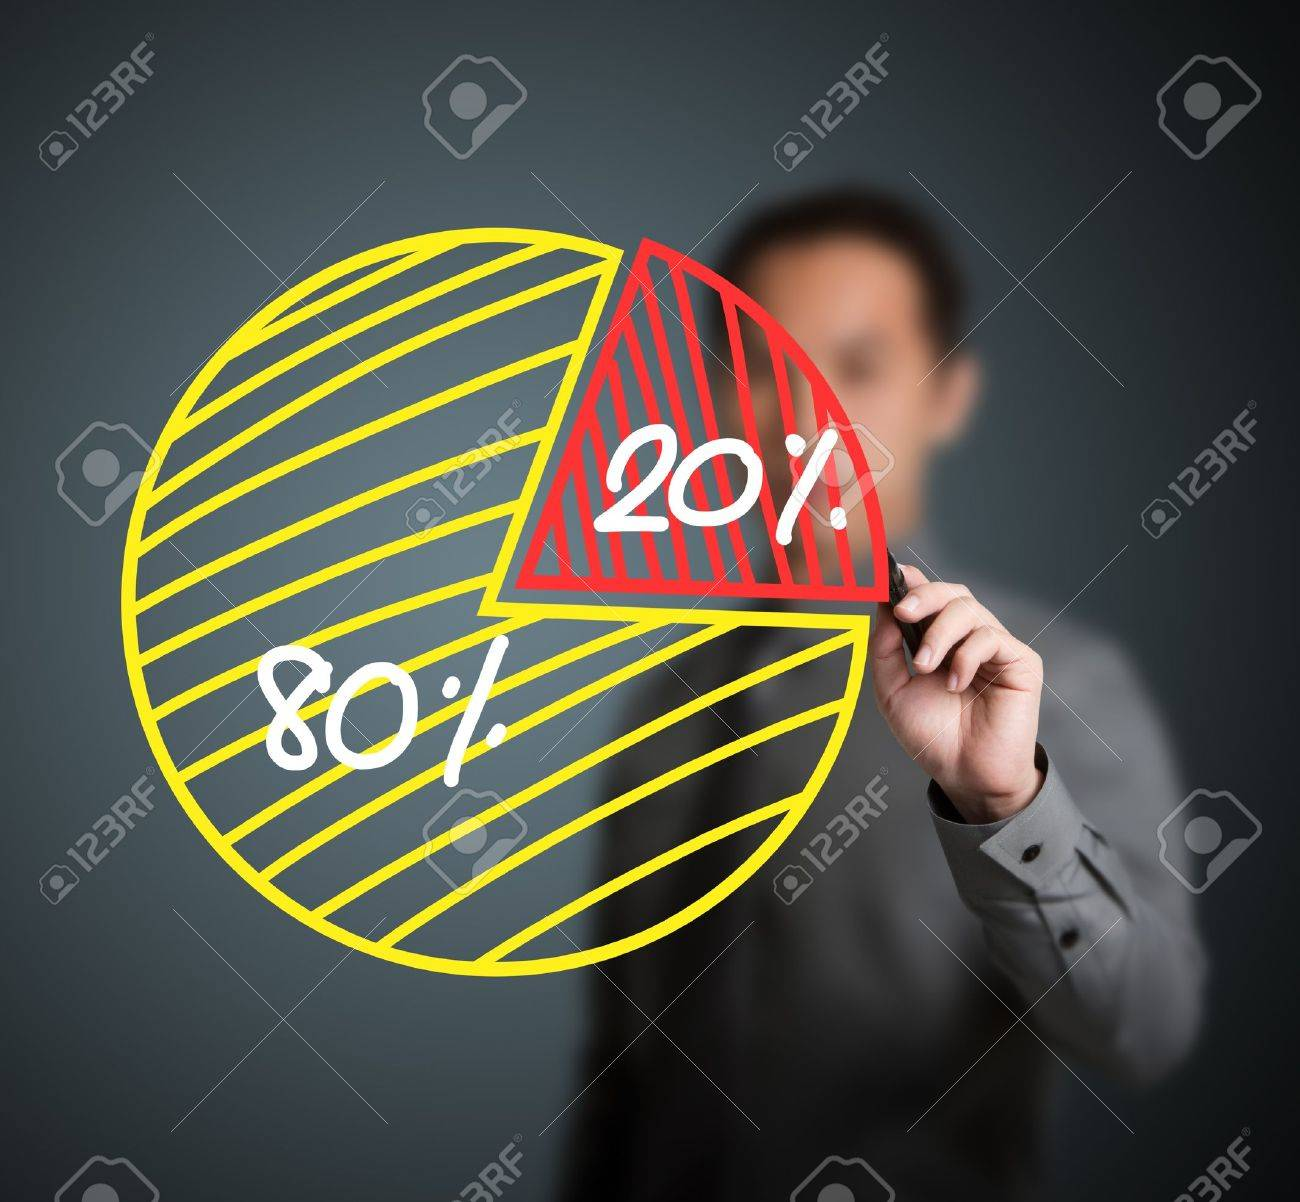 business man drawing 80 - 20 percent pie chart Stock Photo - 13417102